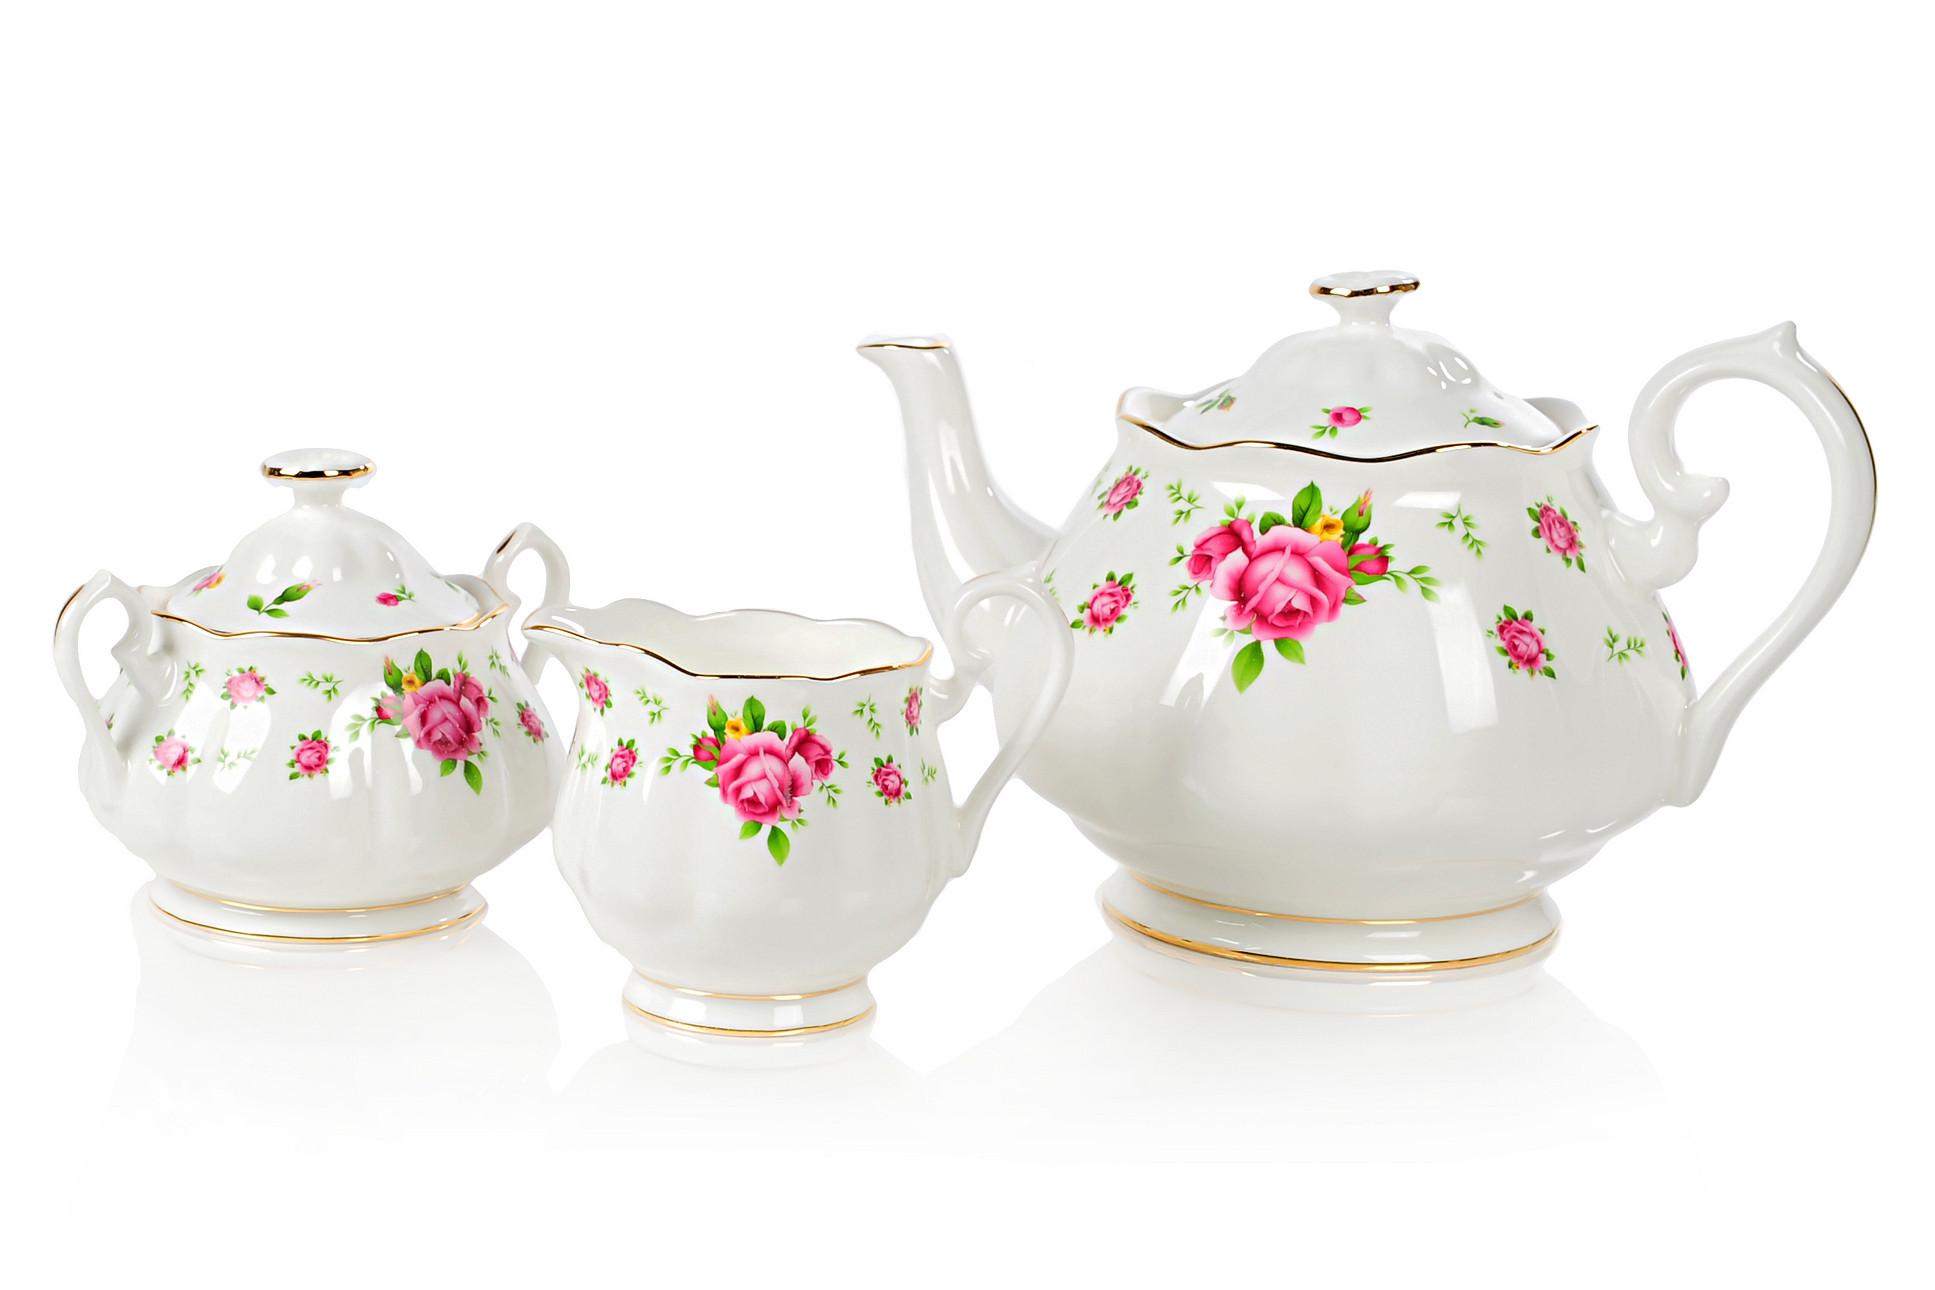 obsession royal albert bone china tea sets maddy loves. Black Bedroom Furniture Sets. Home Design Ideas